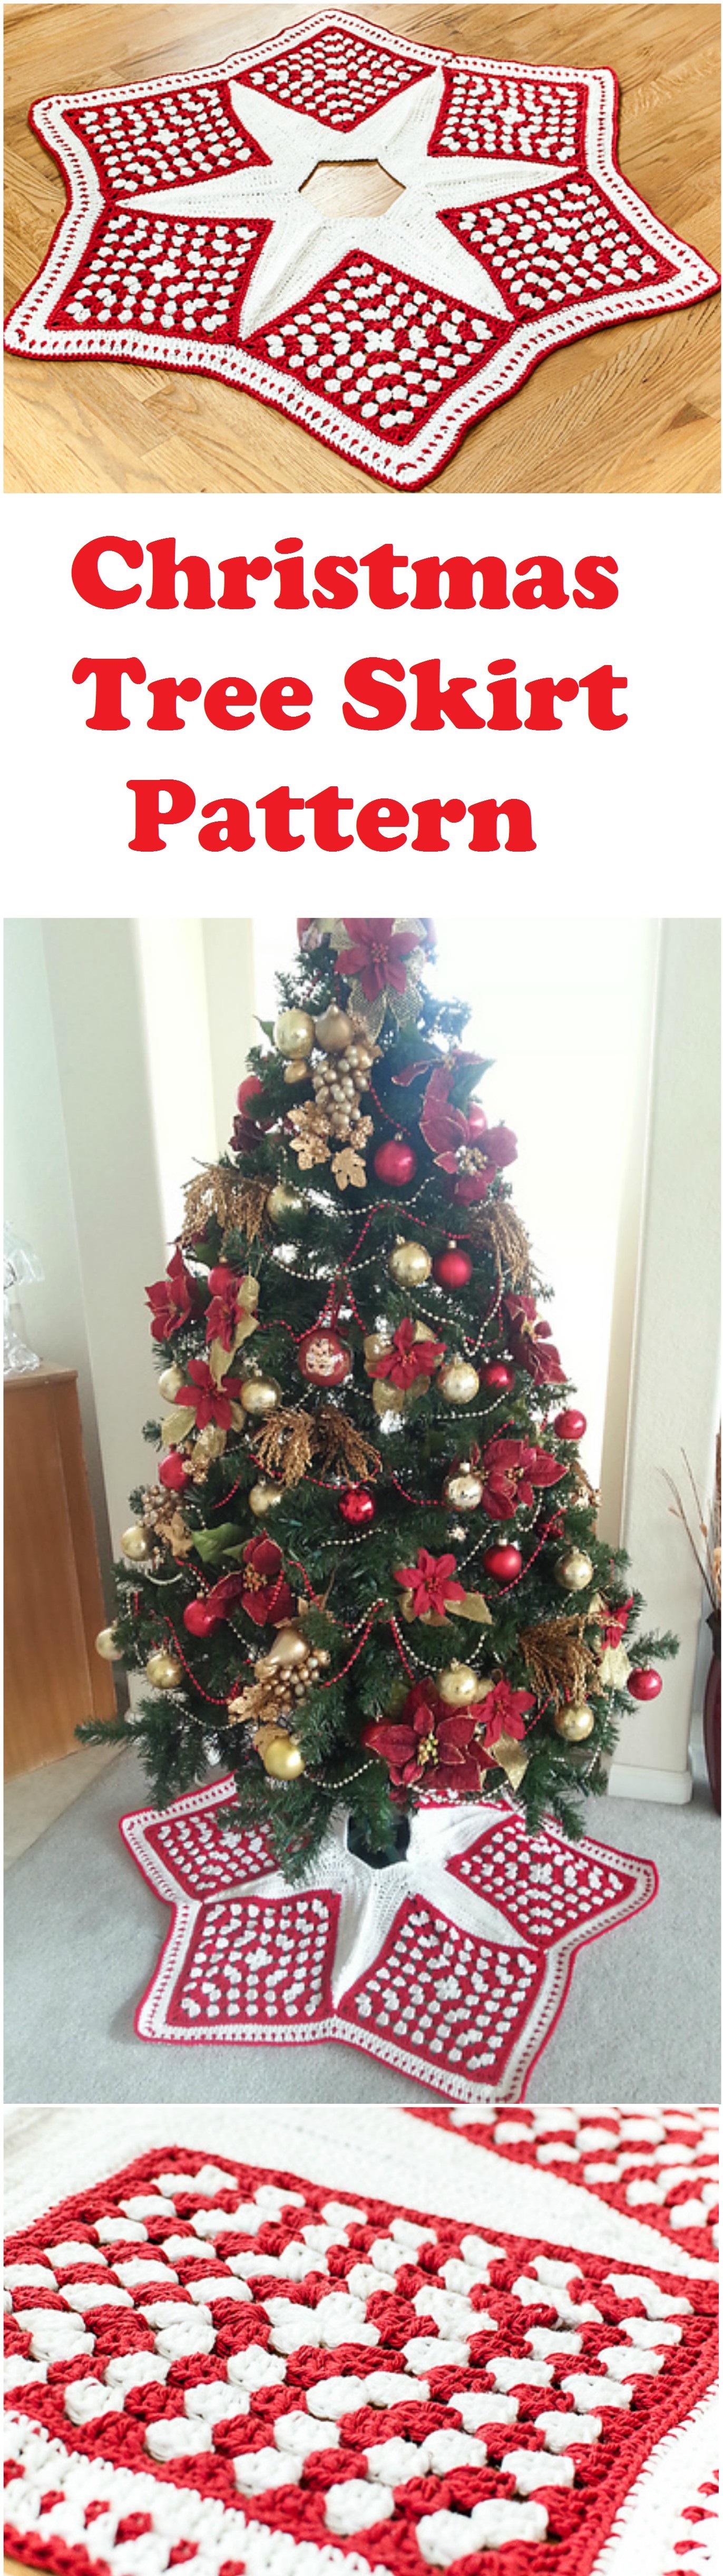 Crochet Christmas Tree Skirt | Crochet projects | Pinterest | Cosas ...